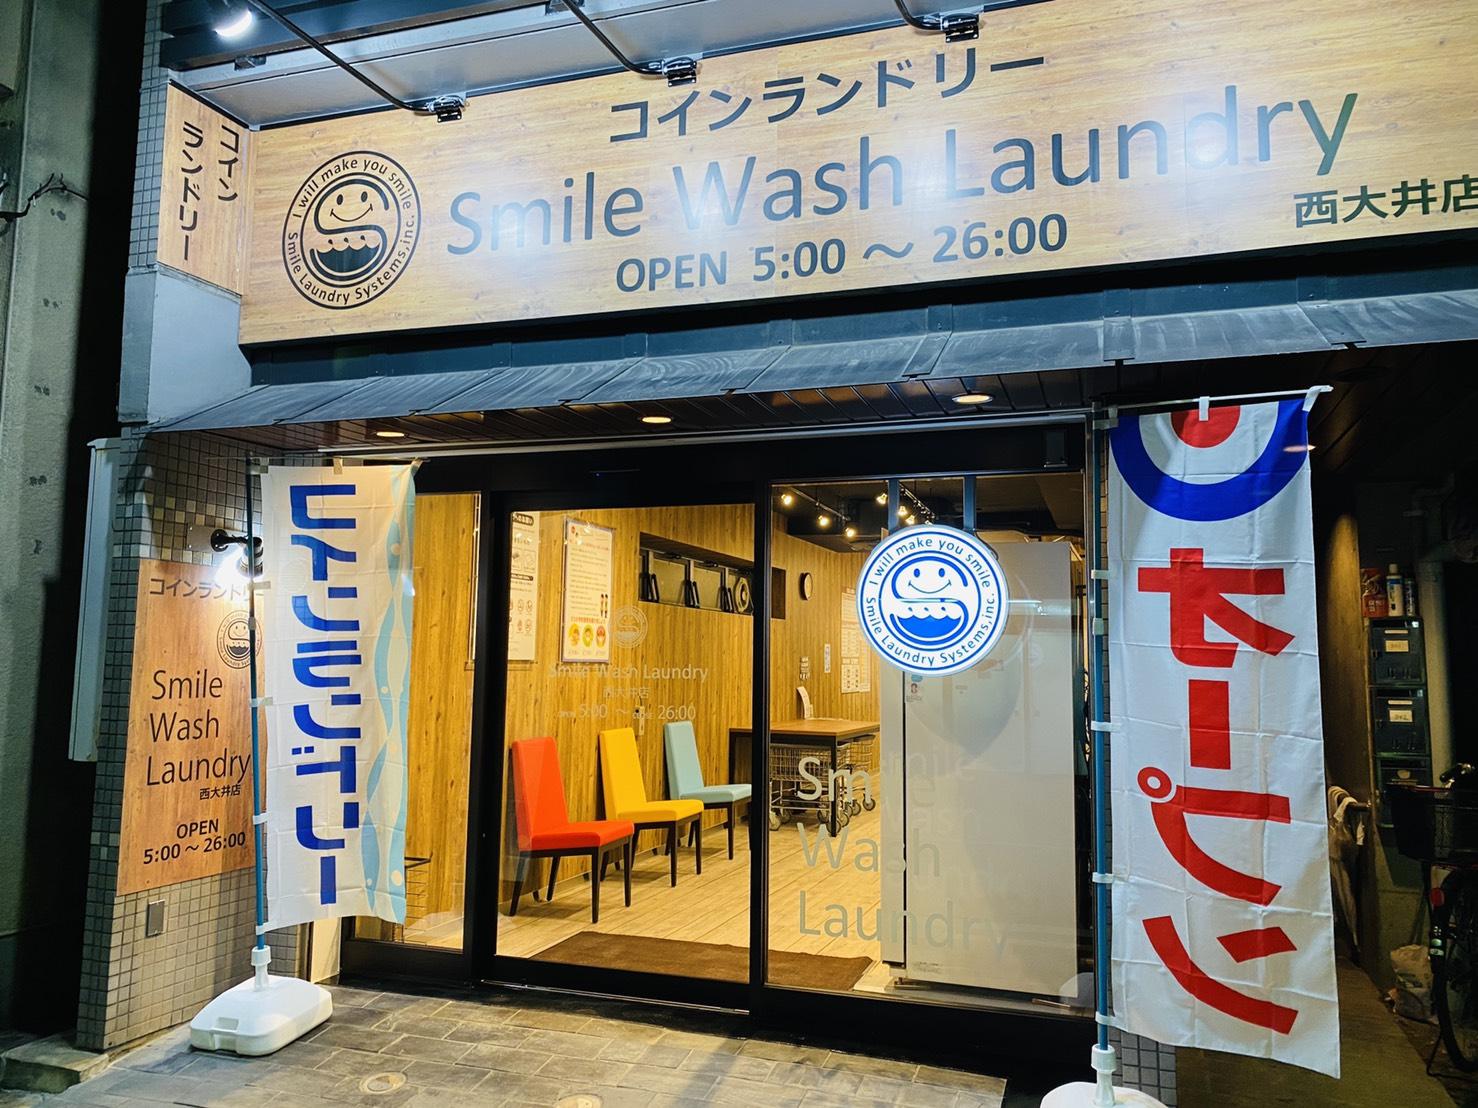 Smile wash Laundry 西大井町店OPENしました!